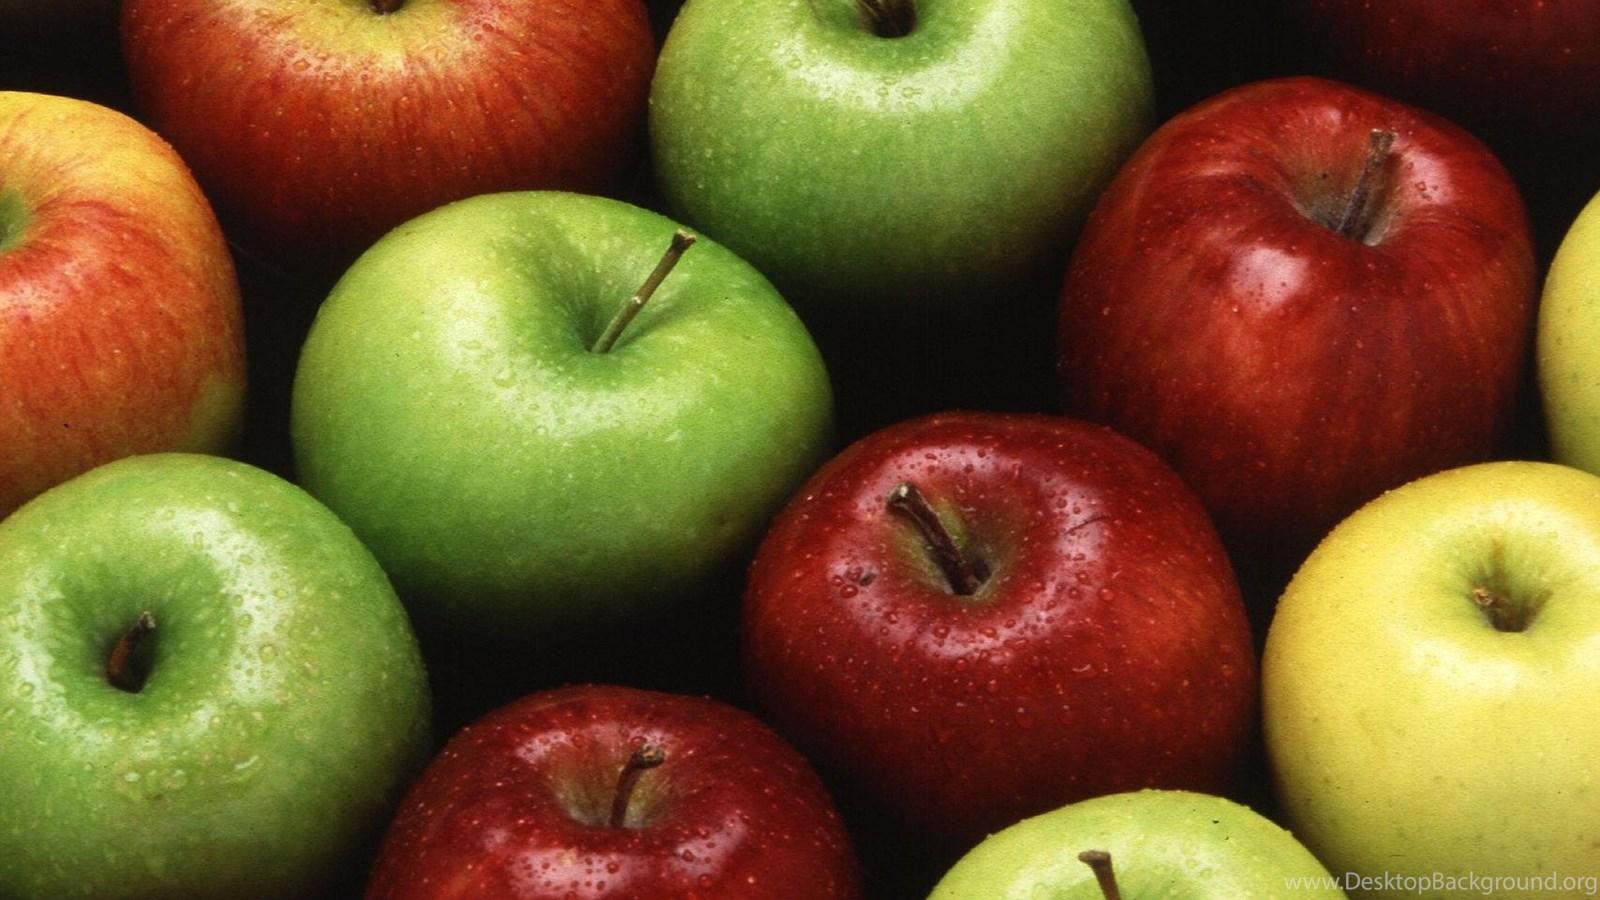 apples wallpaper ( desktop background